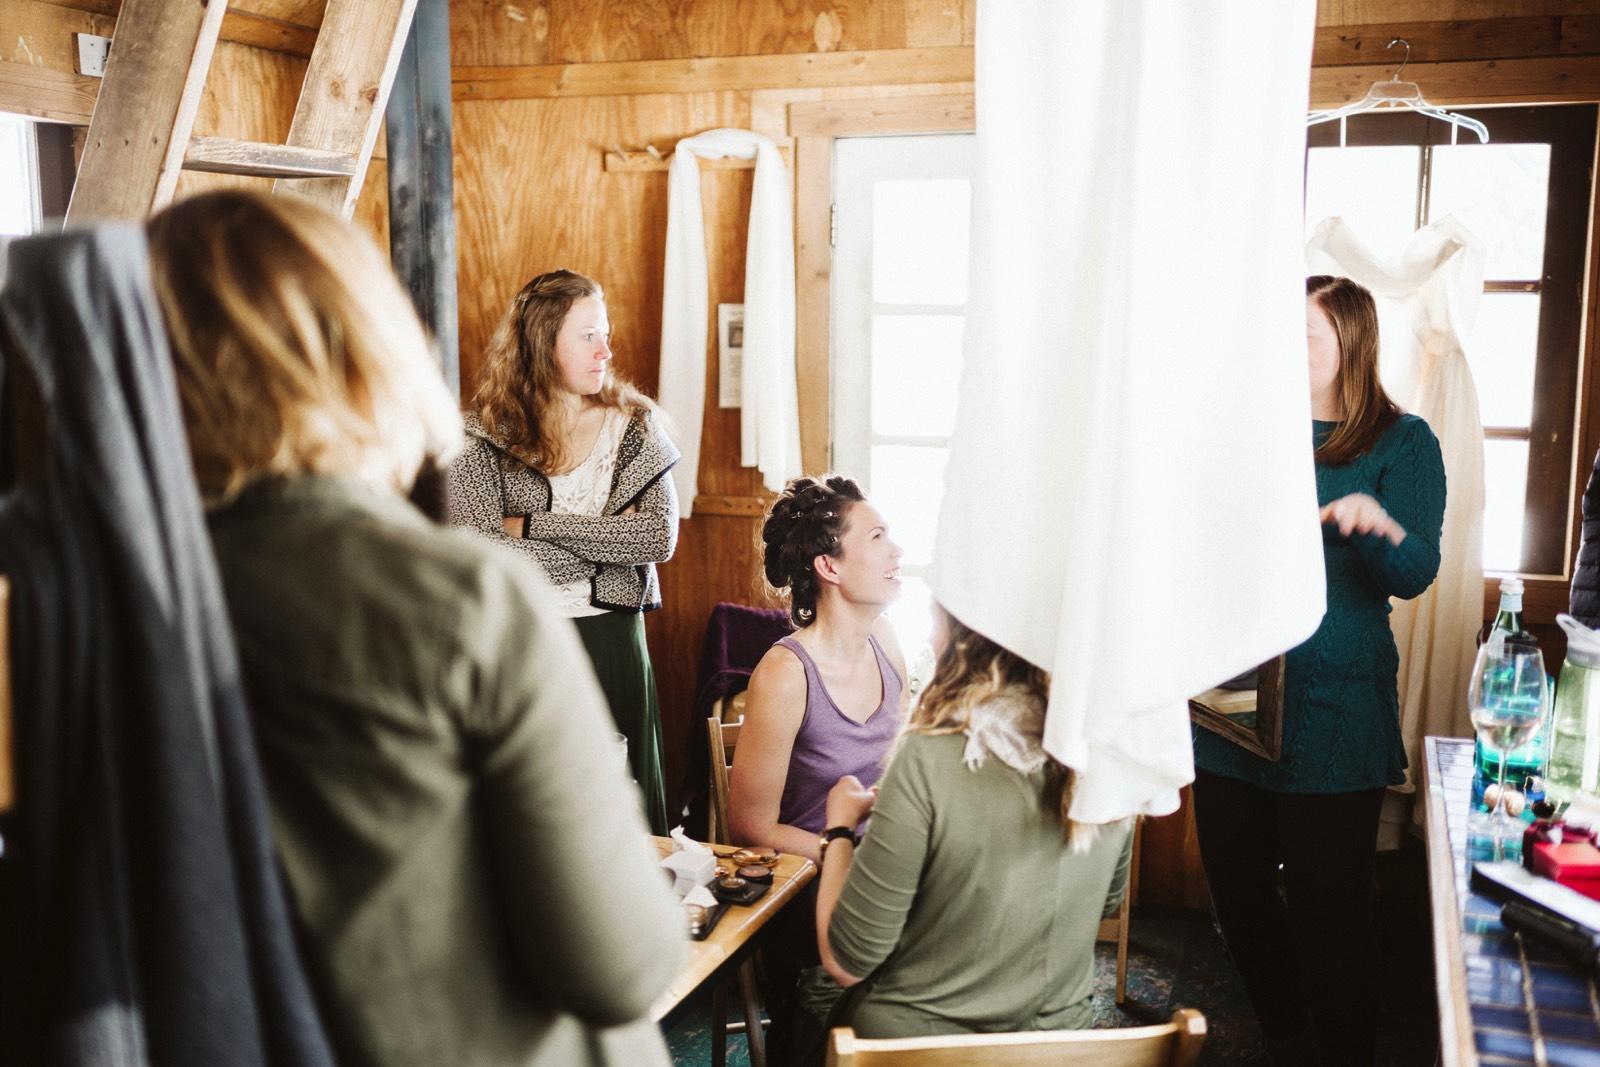 alpine-lakes-high-camp-winter-wedding-08 ALPINE LAKES HIGH CAMP WEDDING